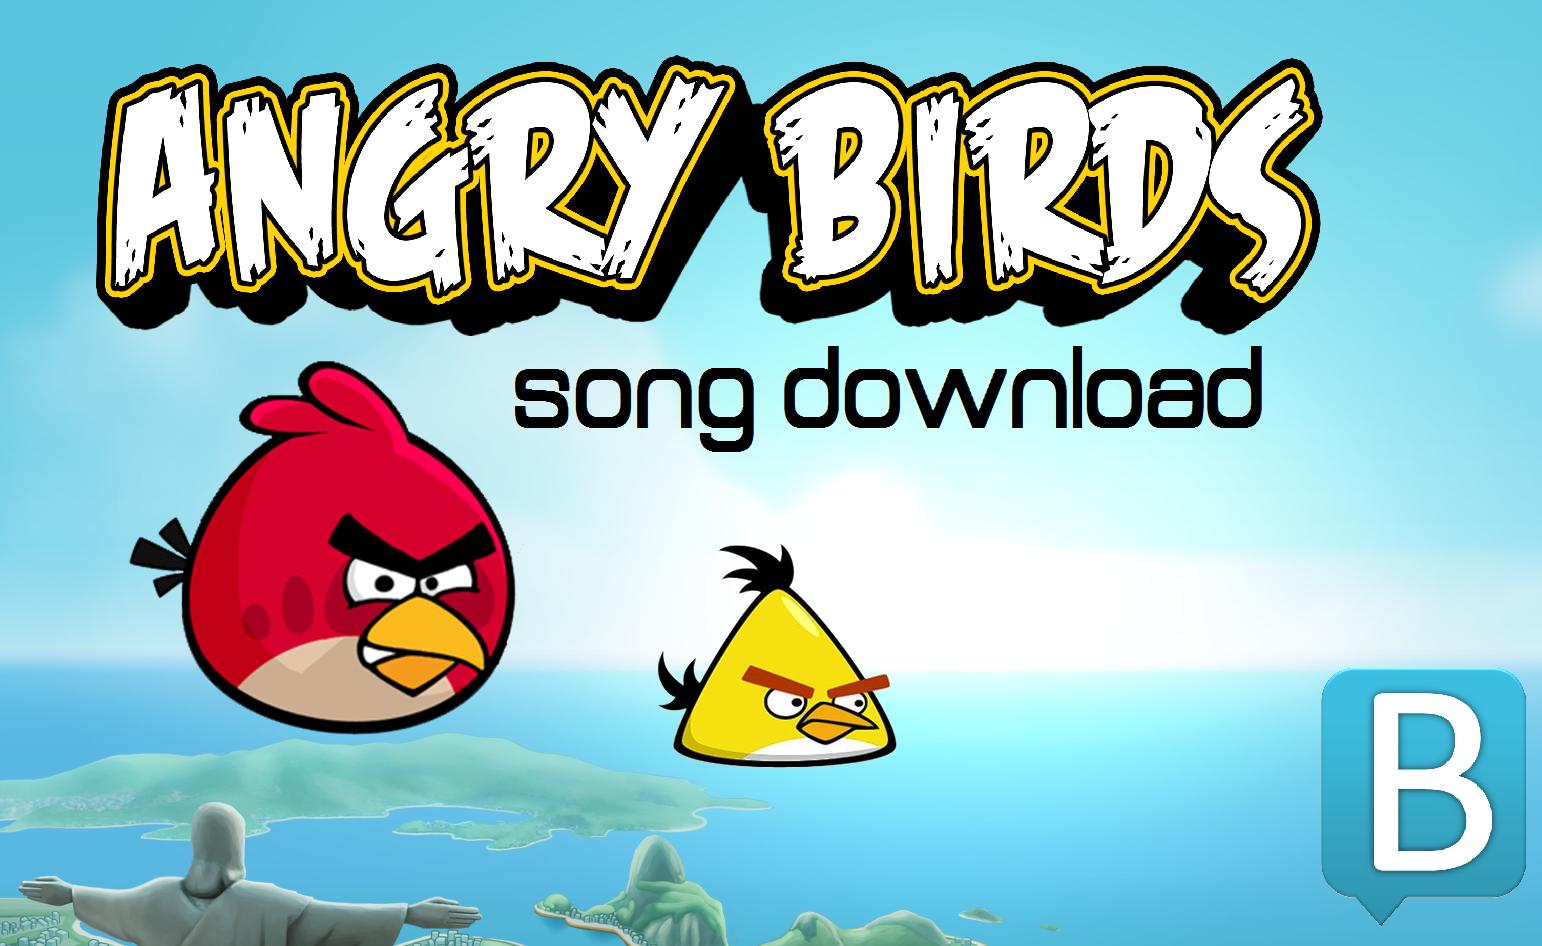 AL STEWART - ANGRY BIRD LYRICS - SongLyrics.com